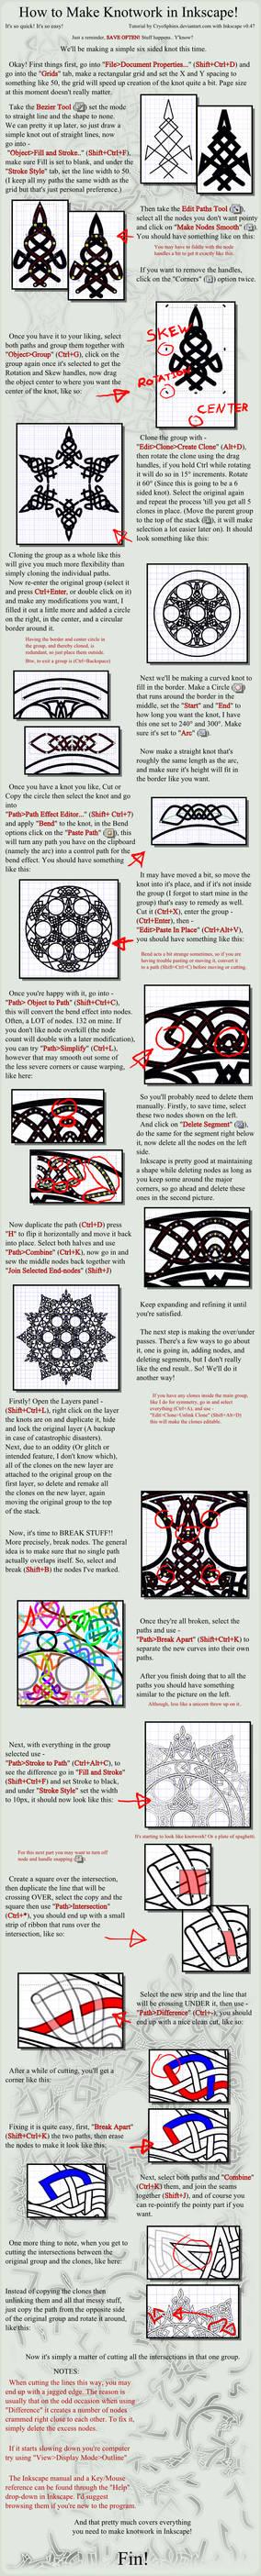 Knotwork Tutorial for Inkscape